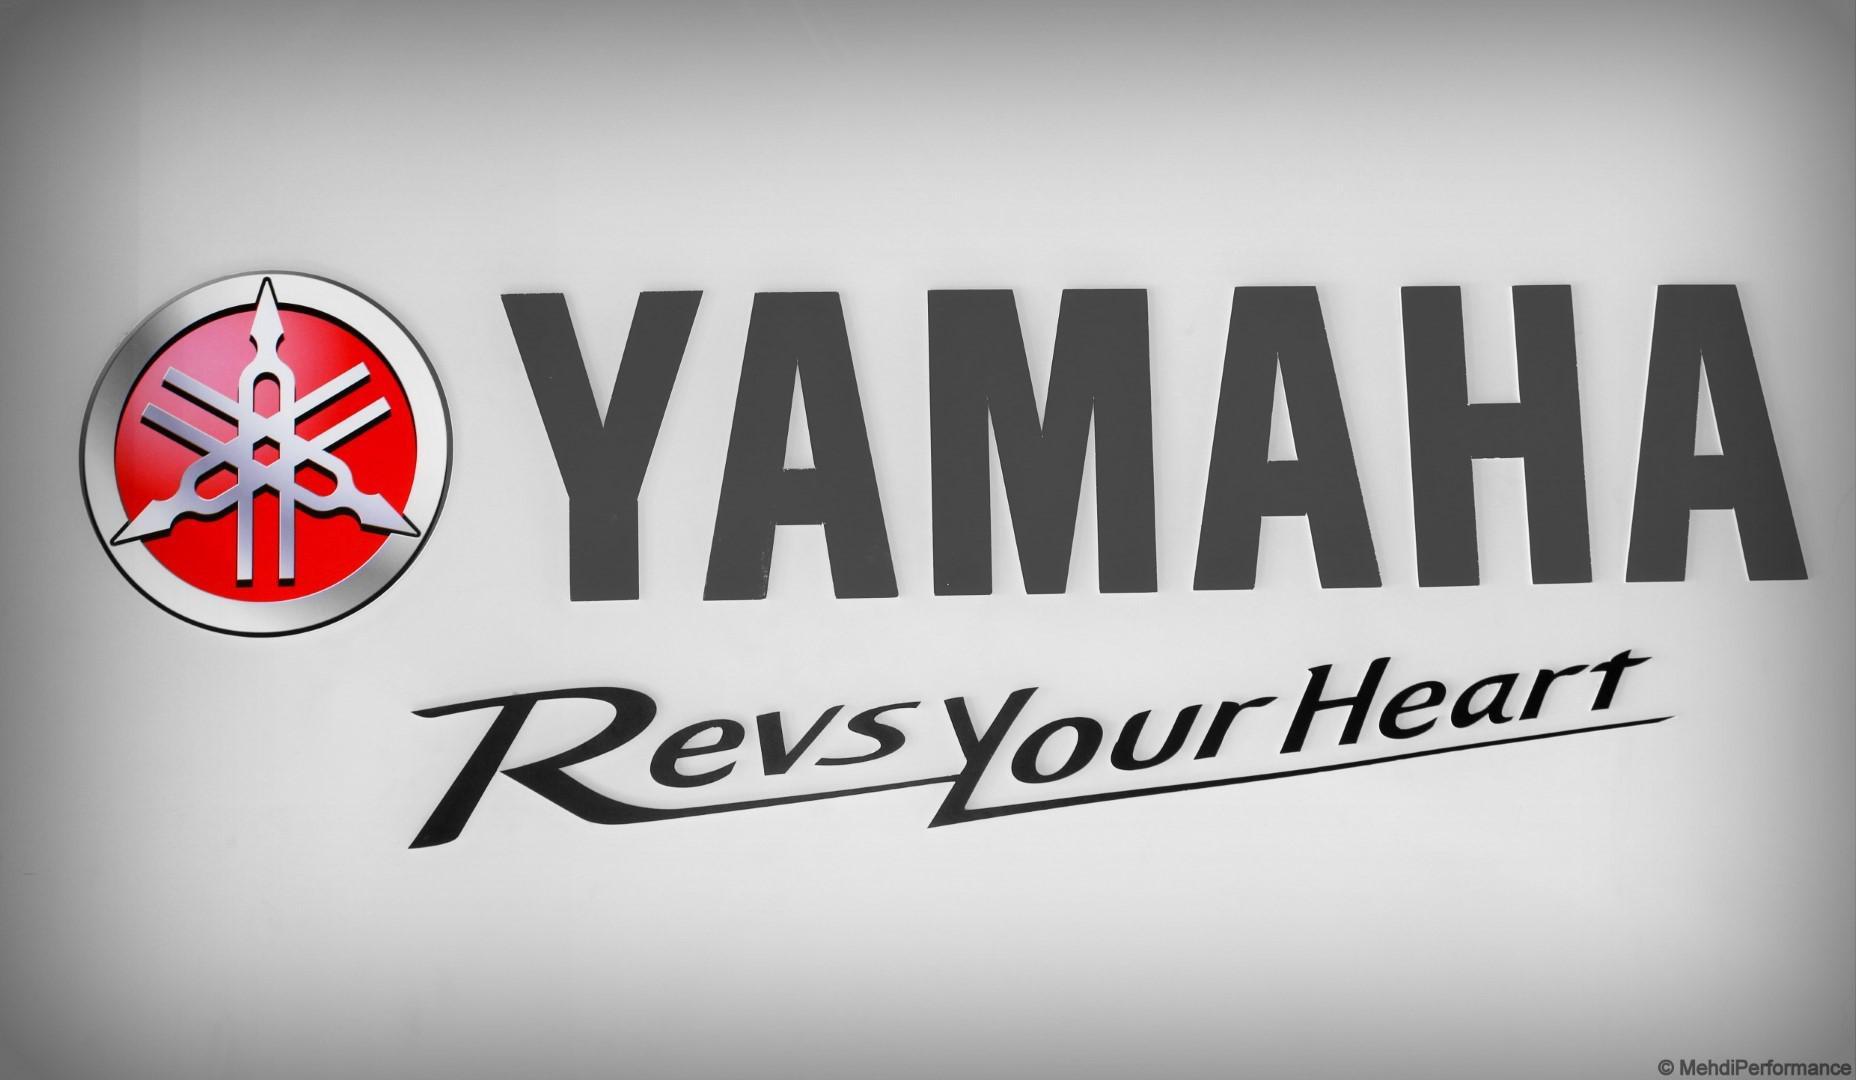 yamaha-ouvre-ses-portes-a-rabat-392-8.jpg